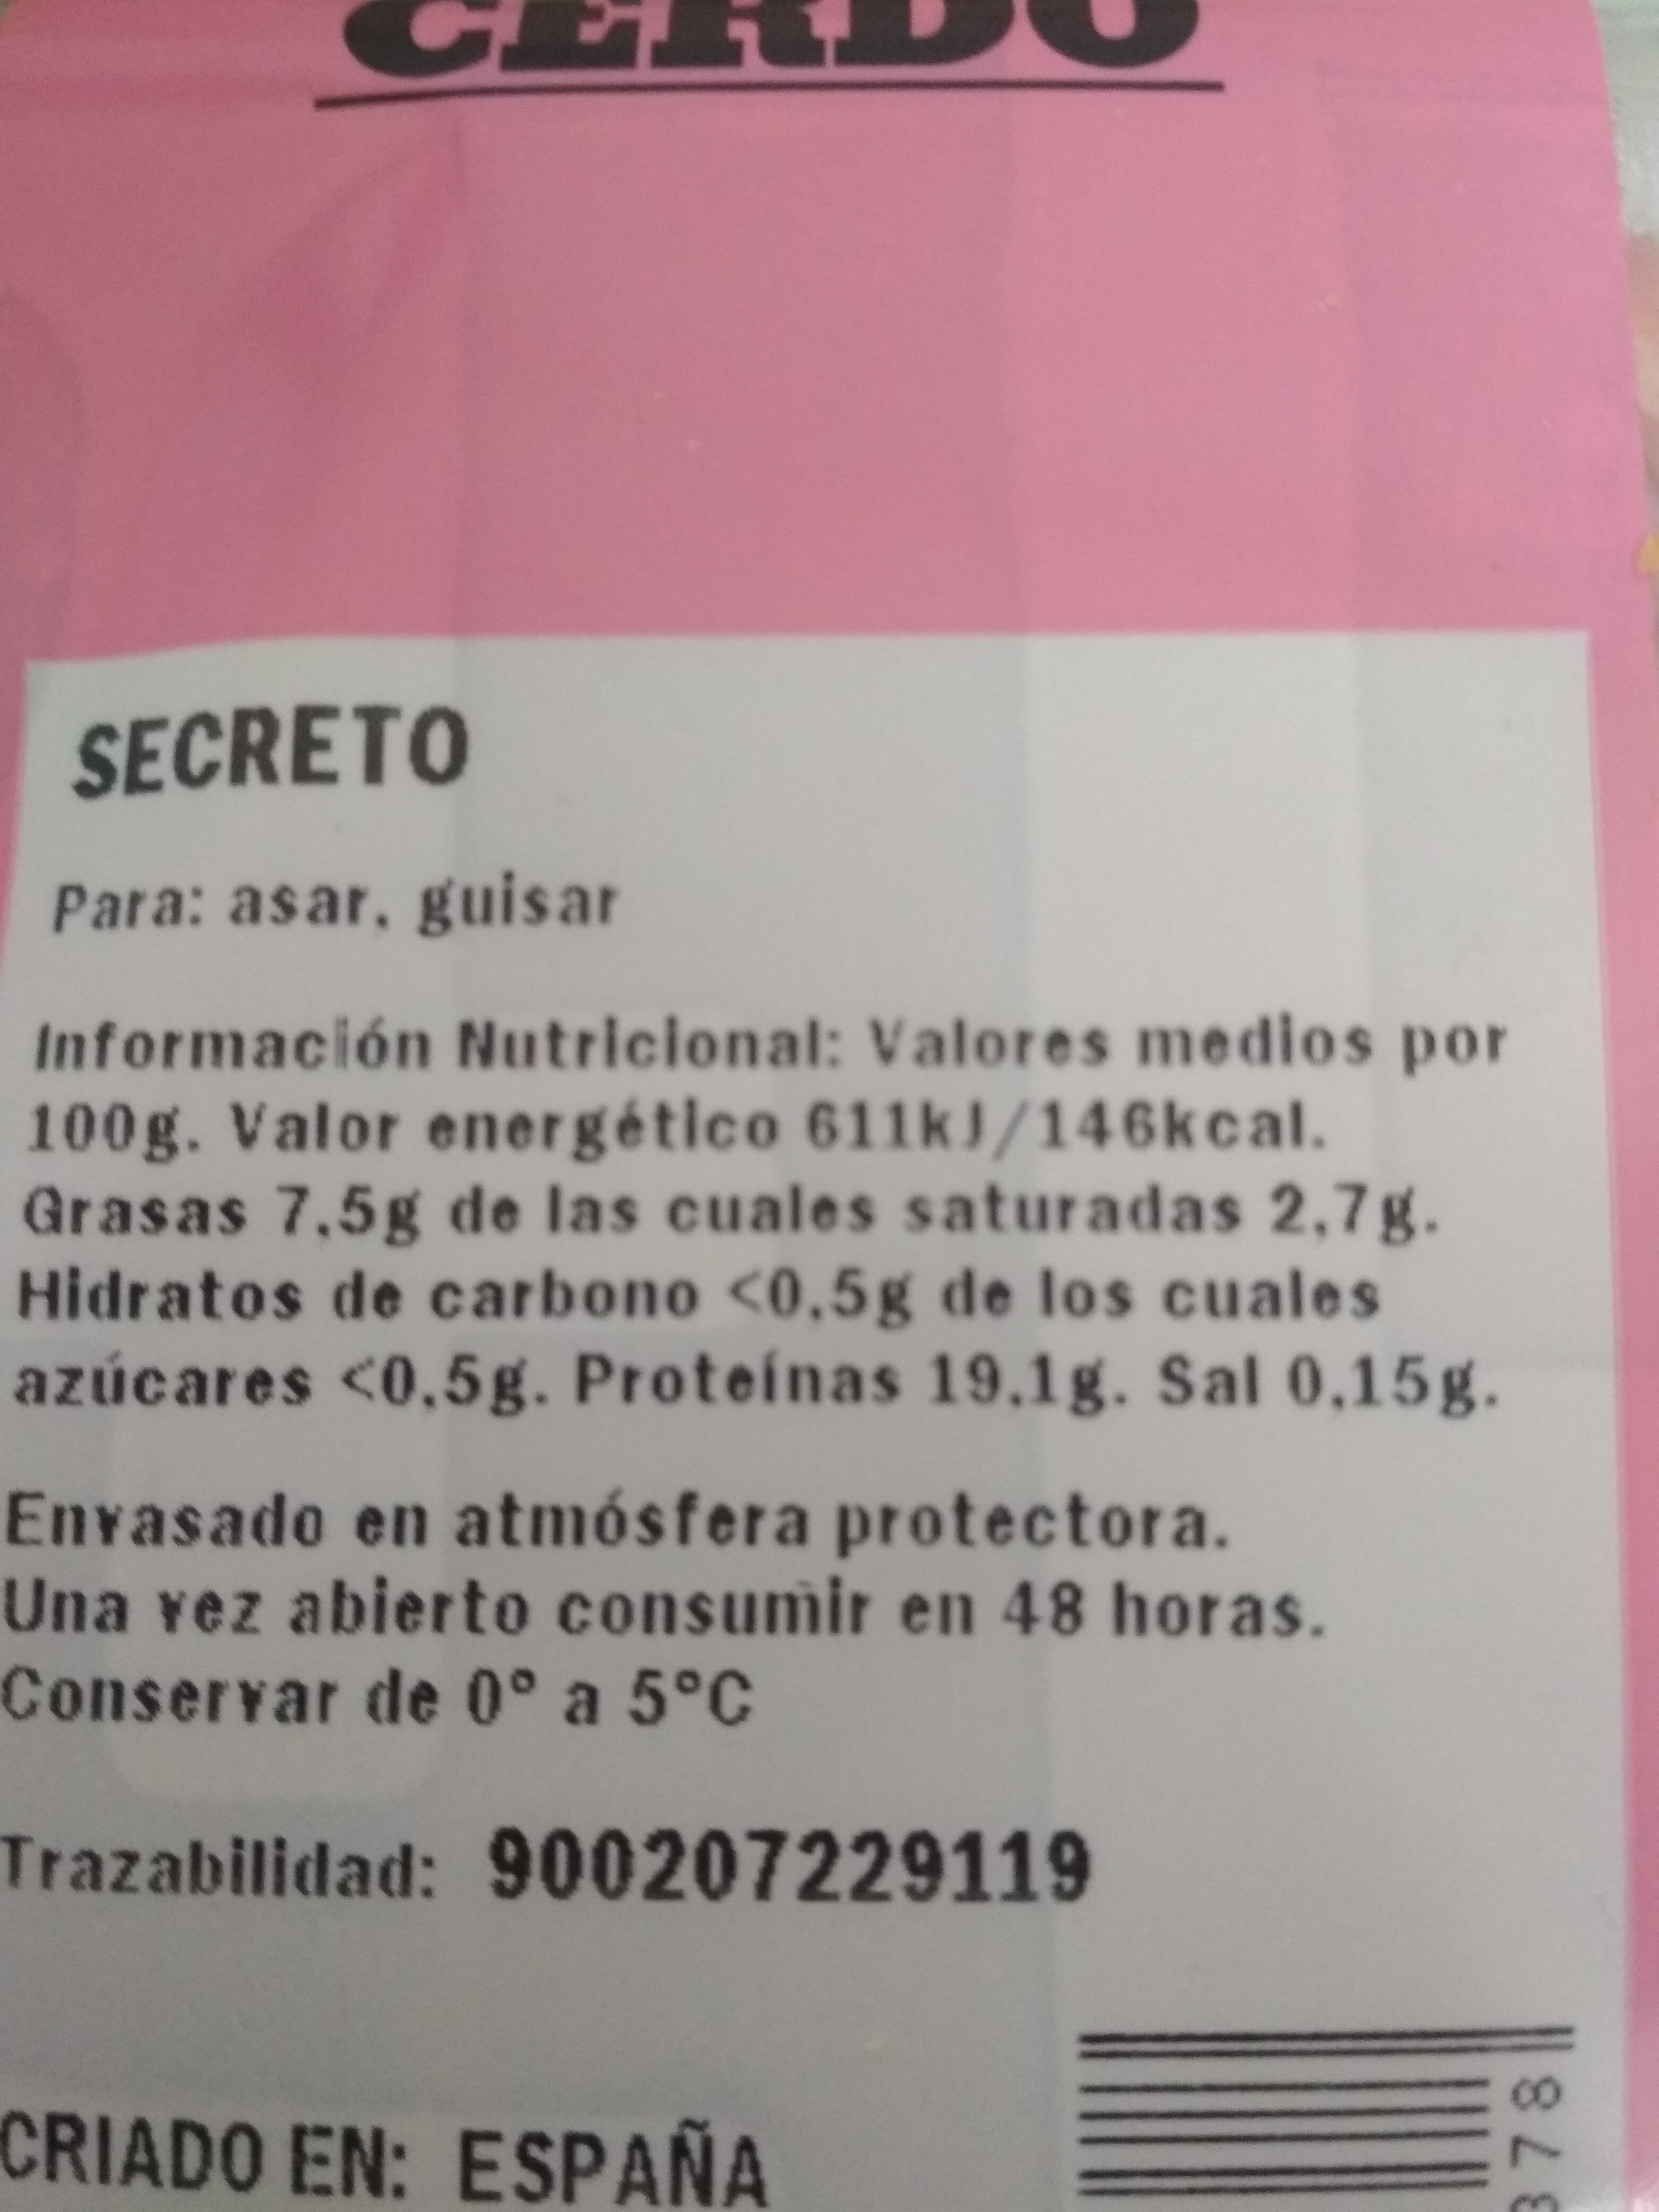 Secreto - Nutrition facts